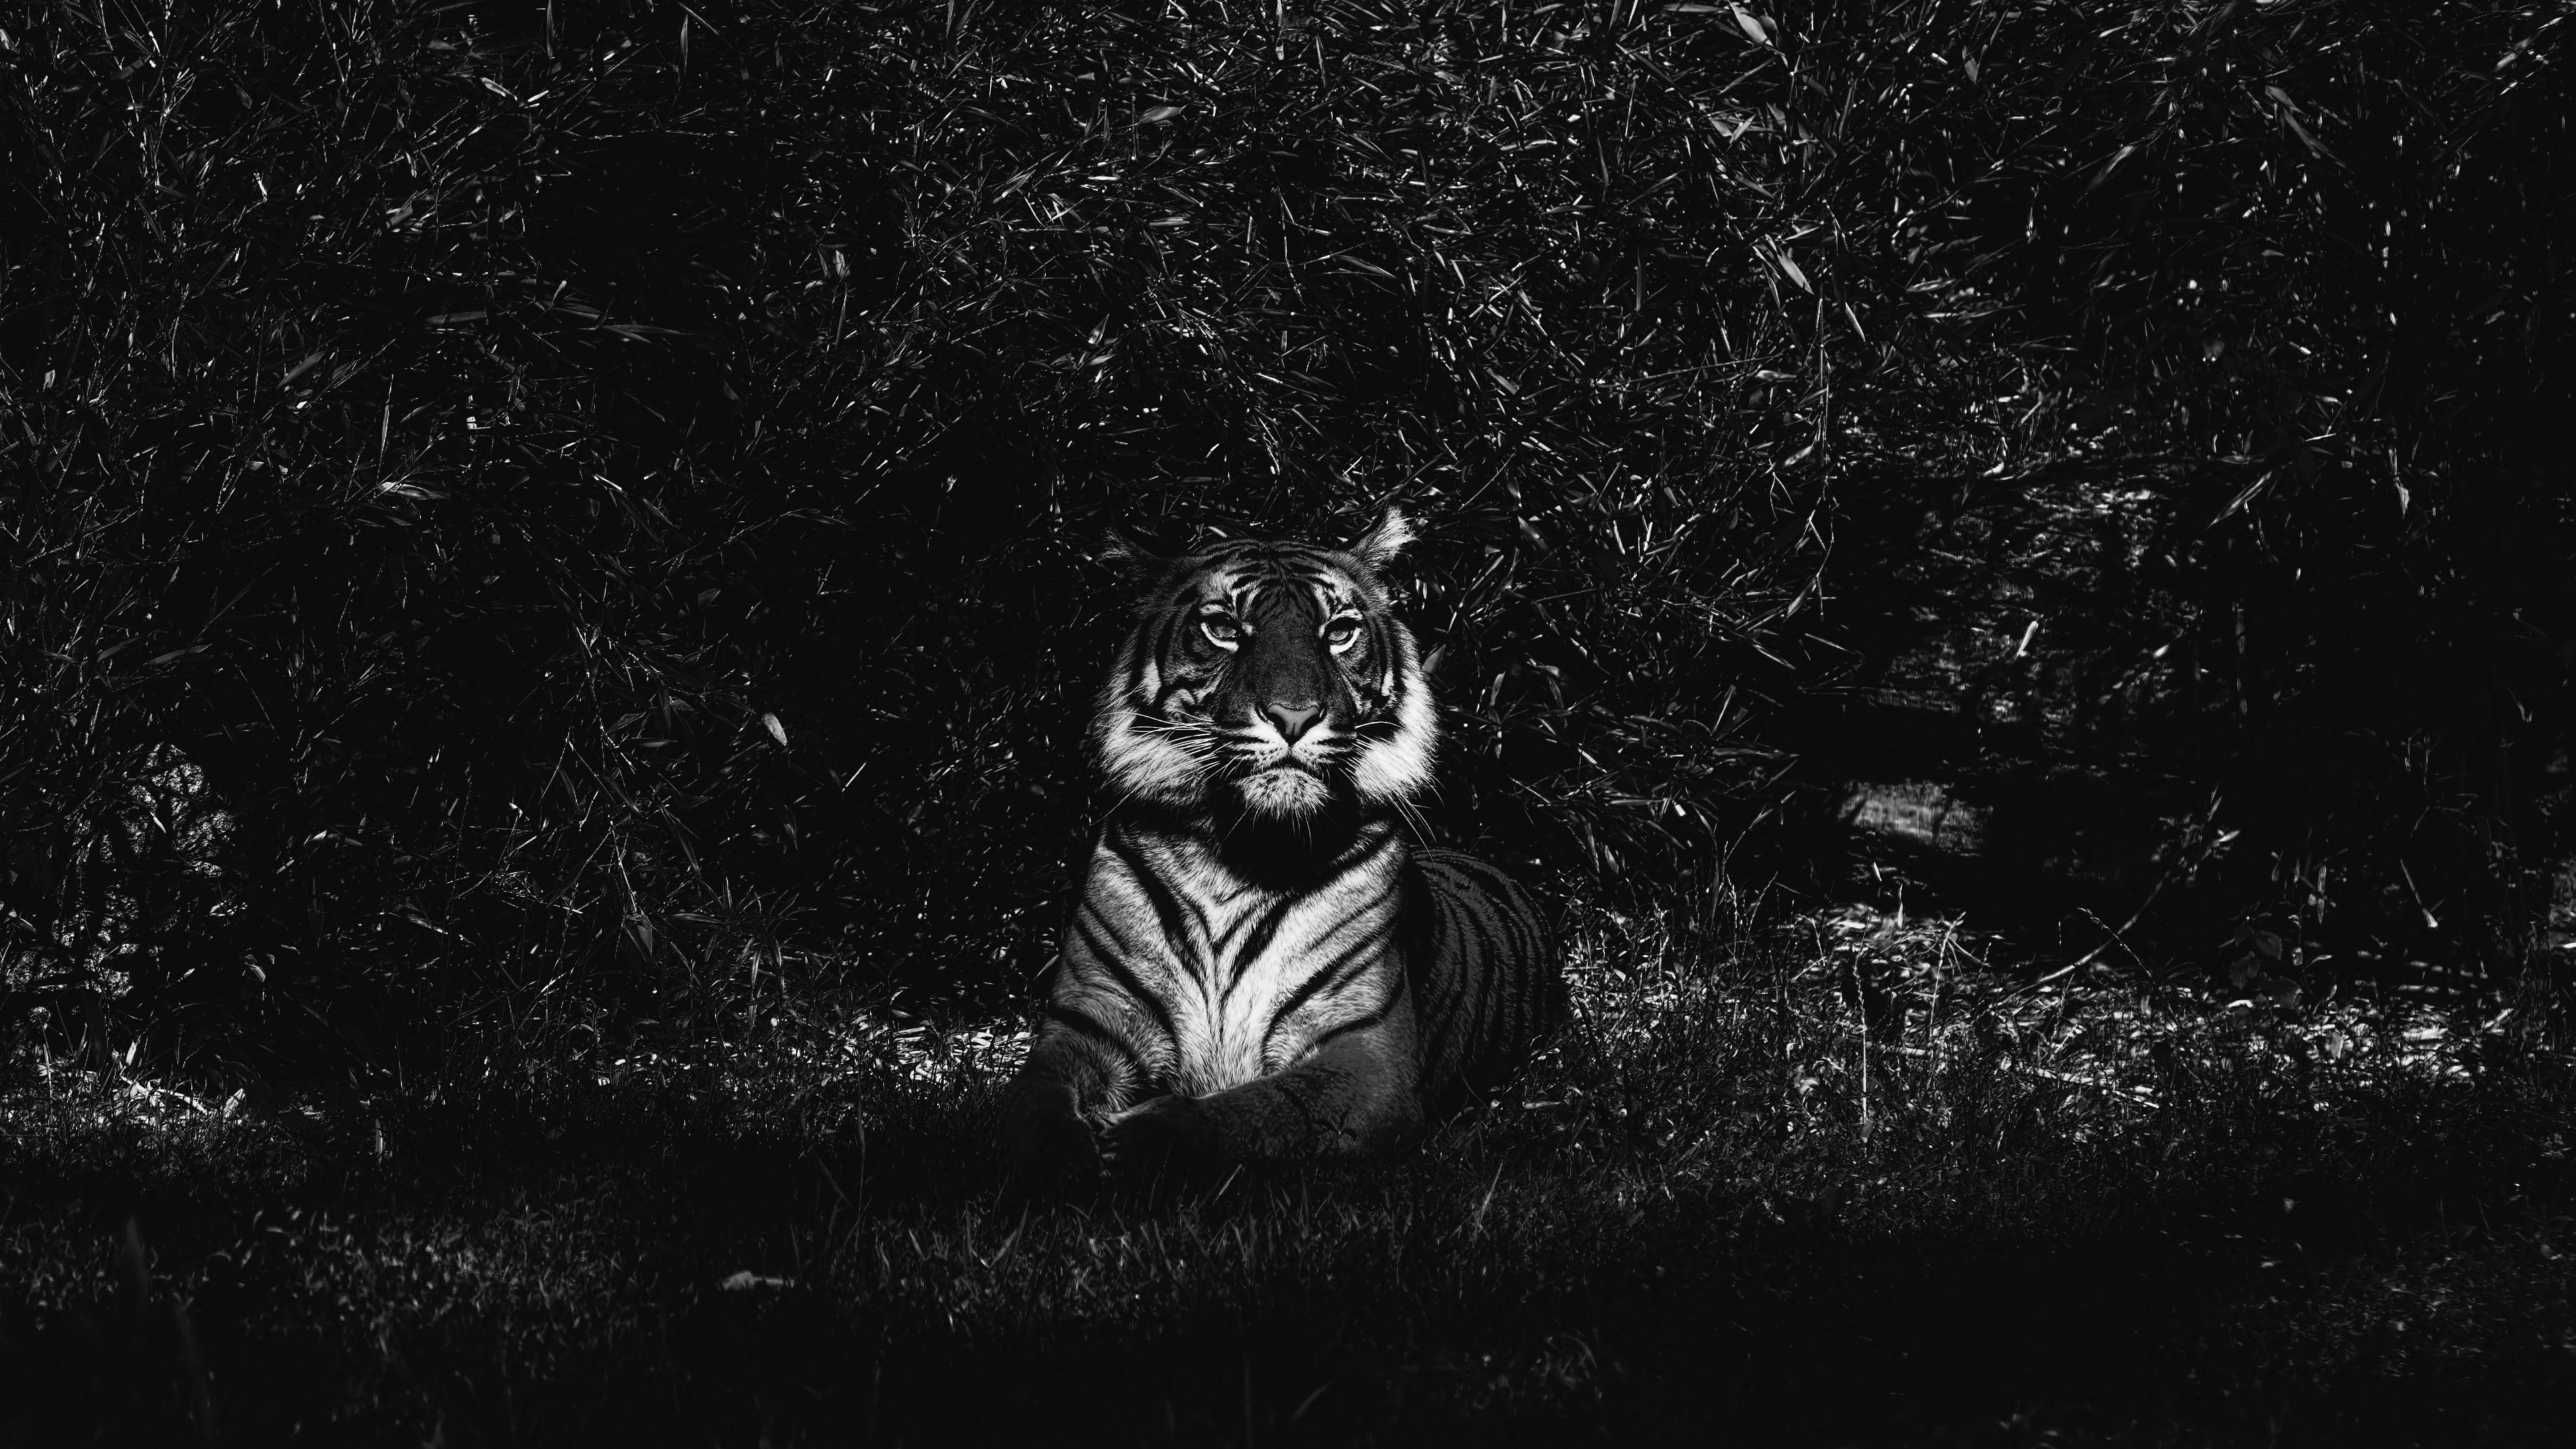 Wallpaper 4k Tiger Predator Lying Bw 4k Lying Predator